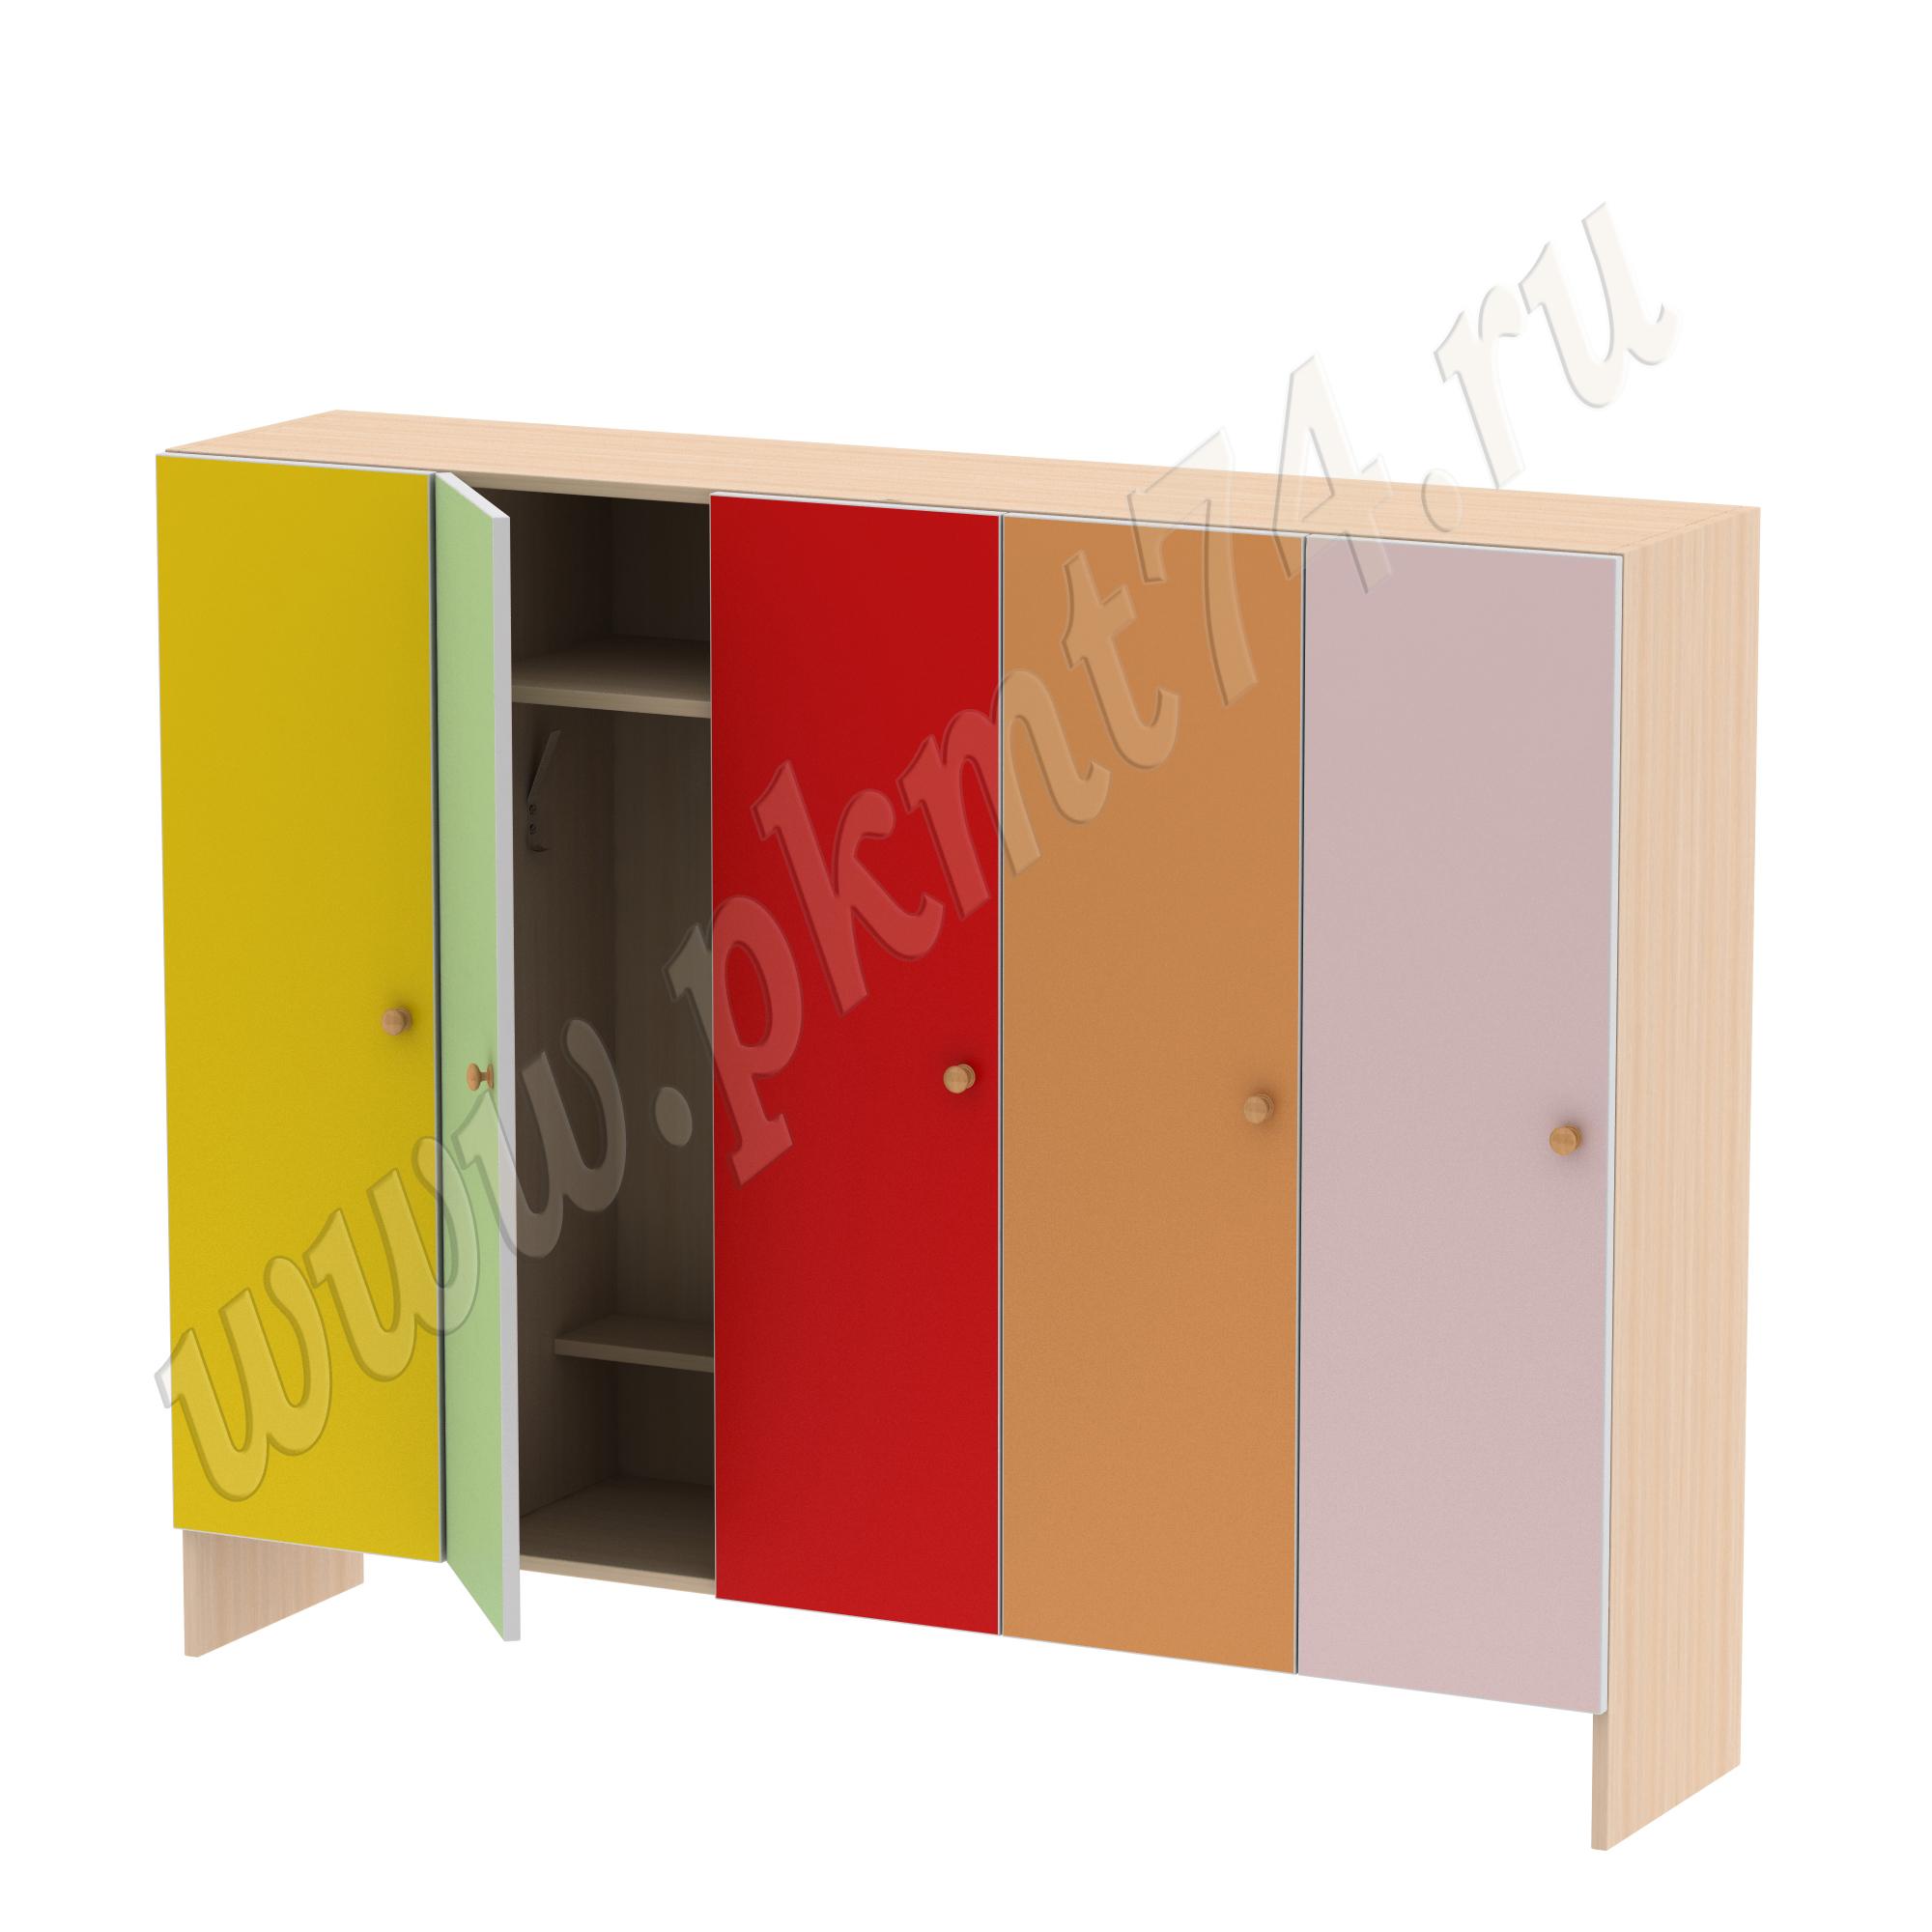 Шкаф для детей пятиместный без короба МТ 17-18 Дуб Мол-Желт-Салат-Красн-Оранж-Ирис